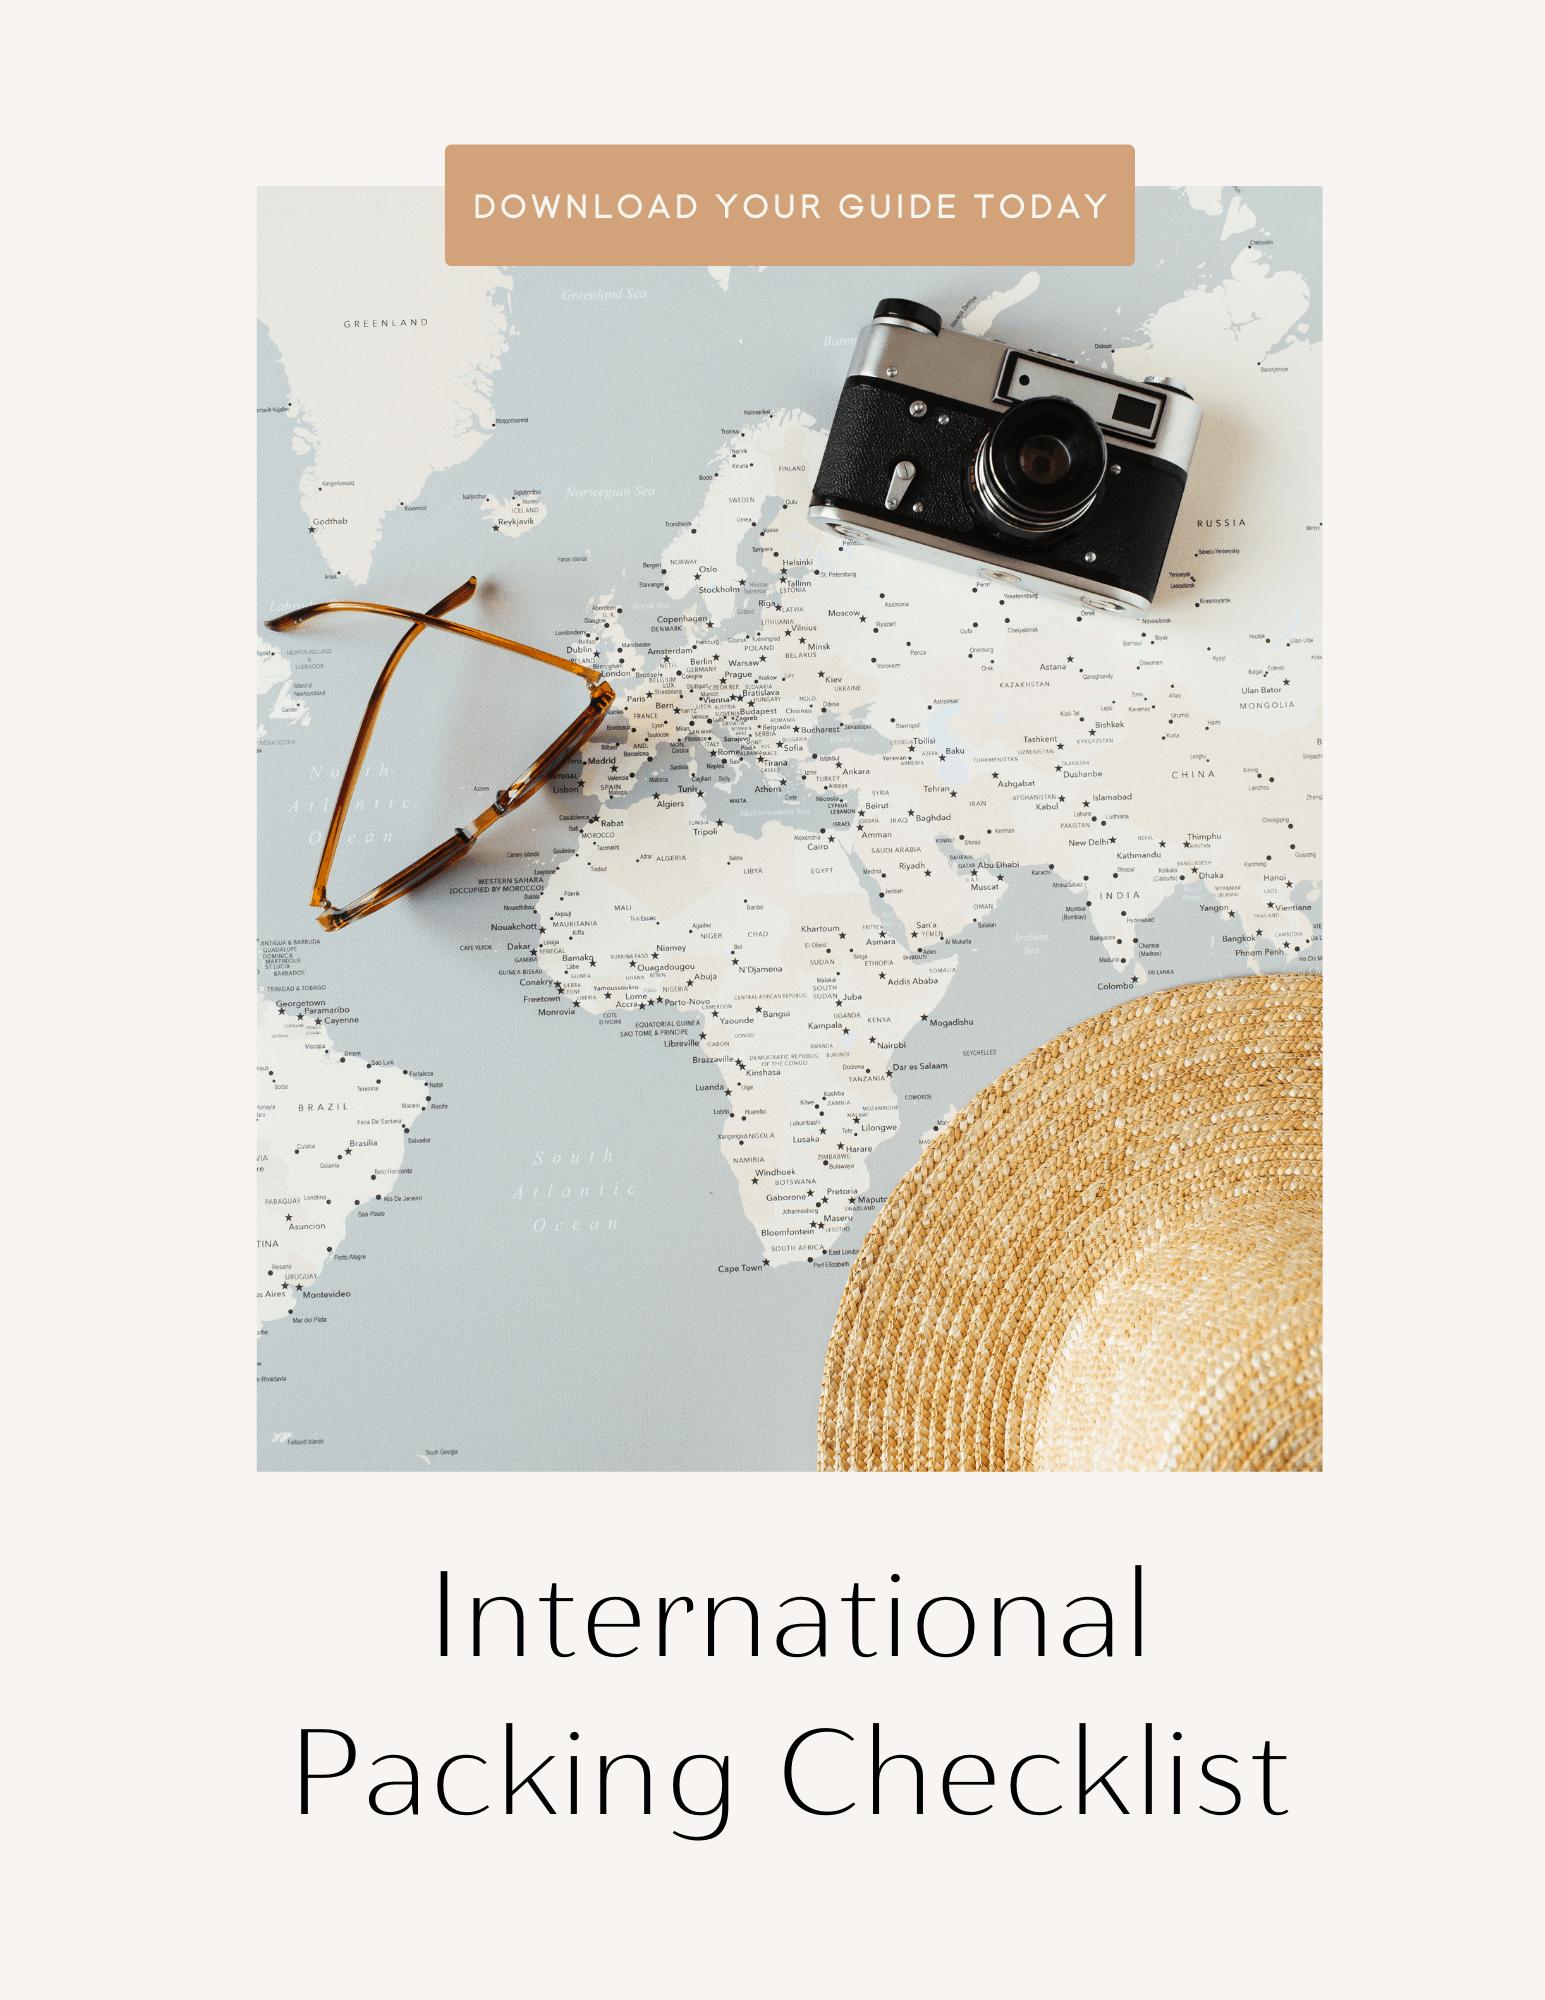 International packing checklist